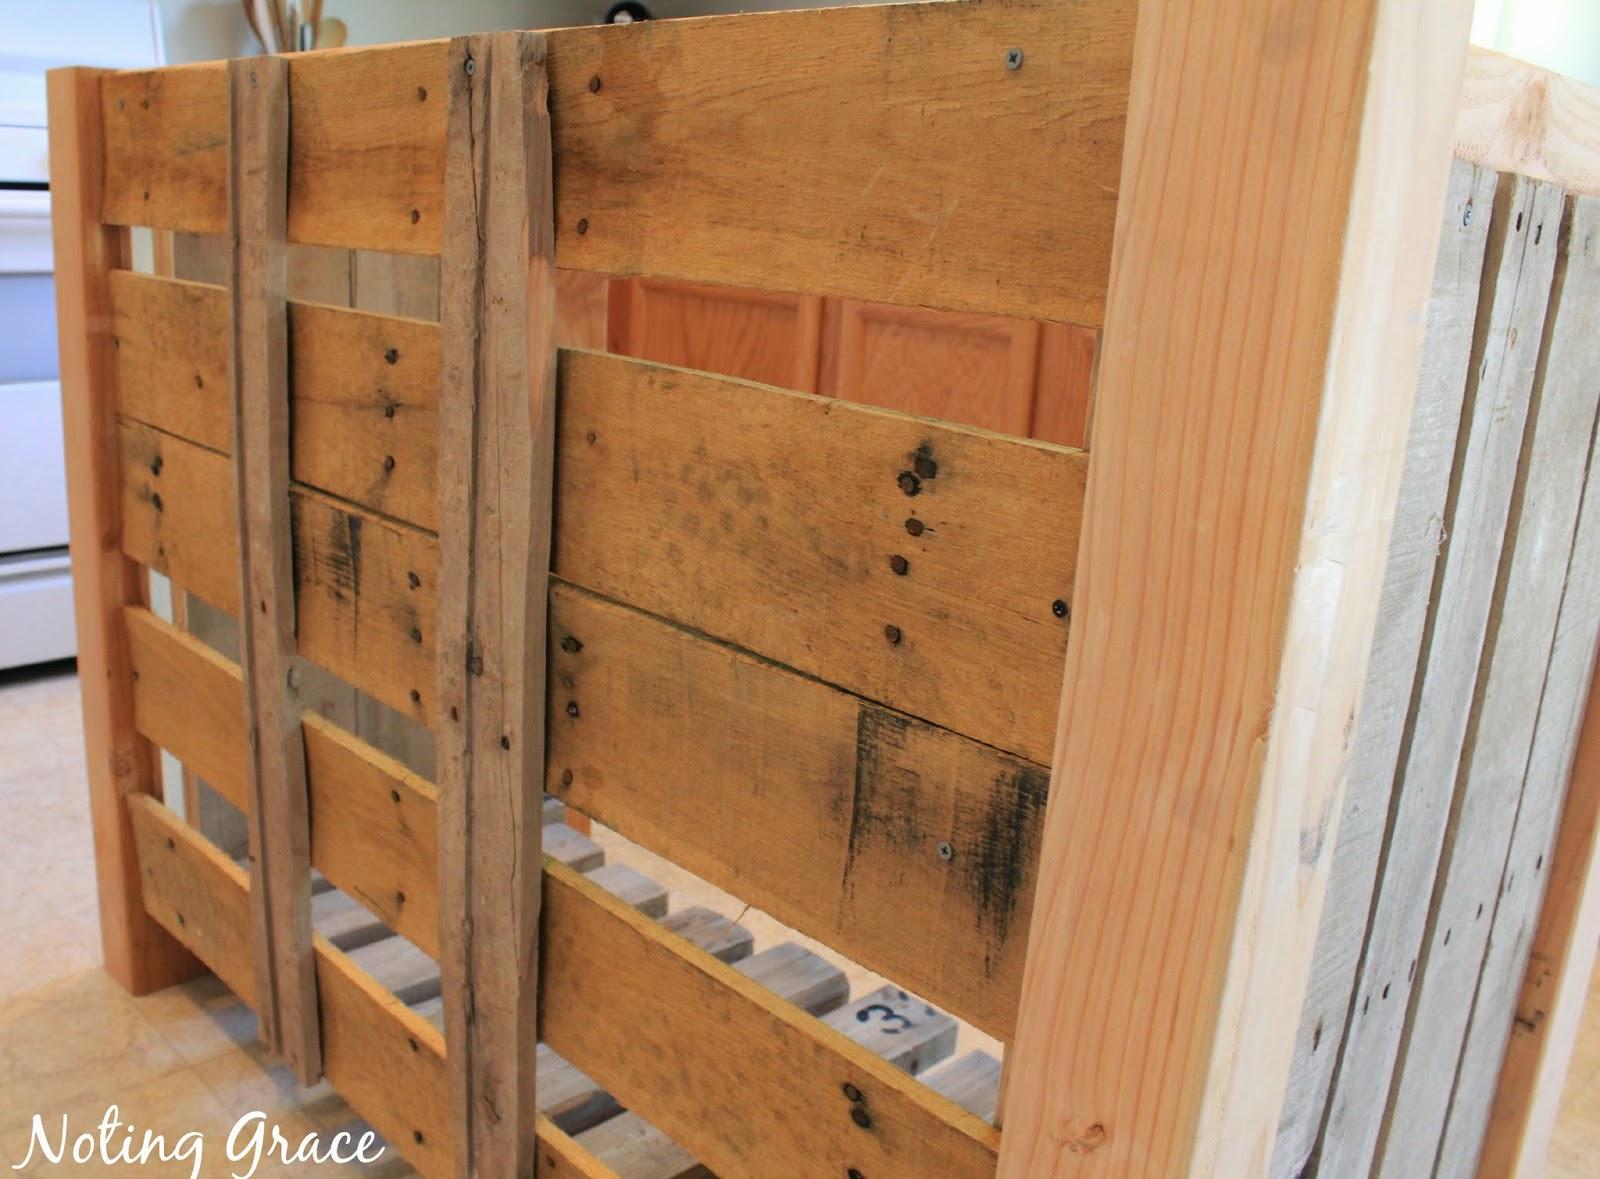 Create a DIY Pallet Wood Kitchen Island for less than $40! Full tutorial on notinggrace.blogspot.com